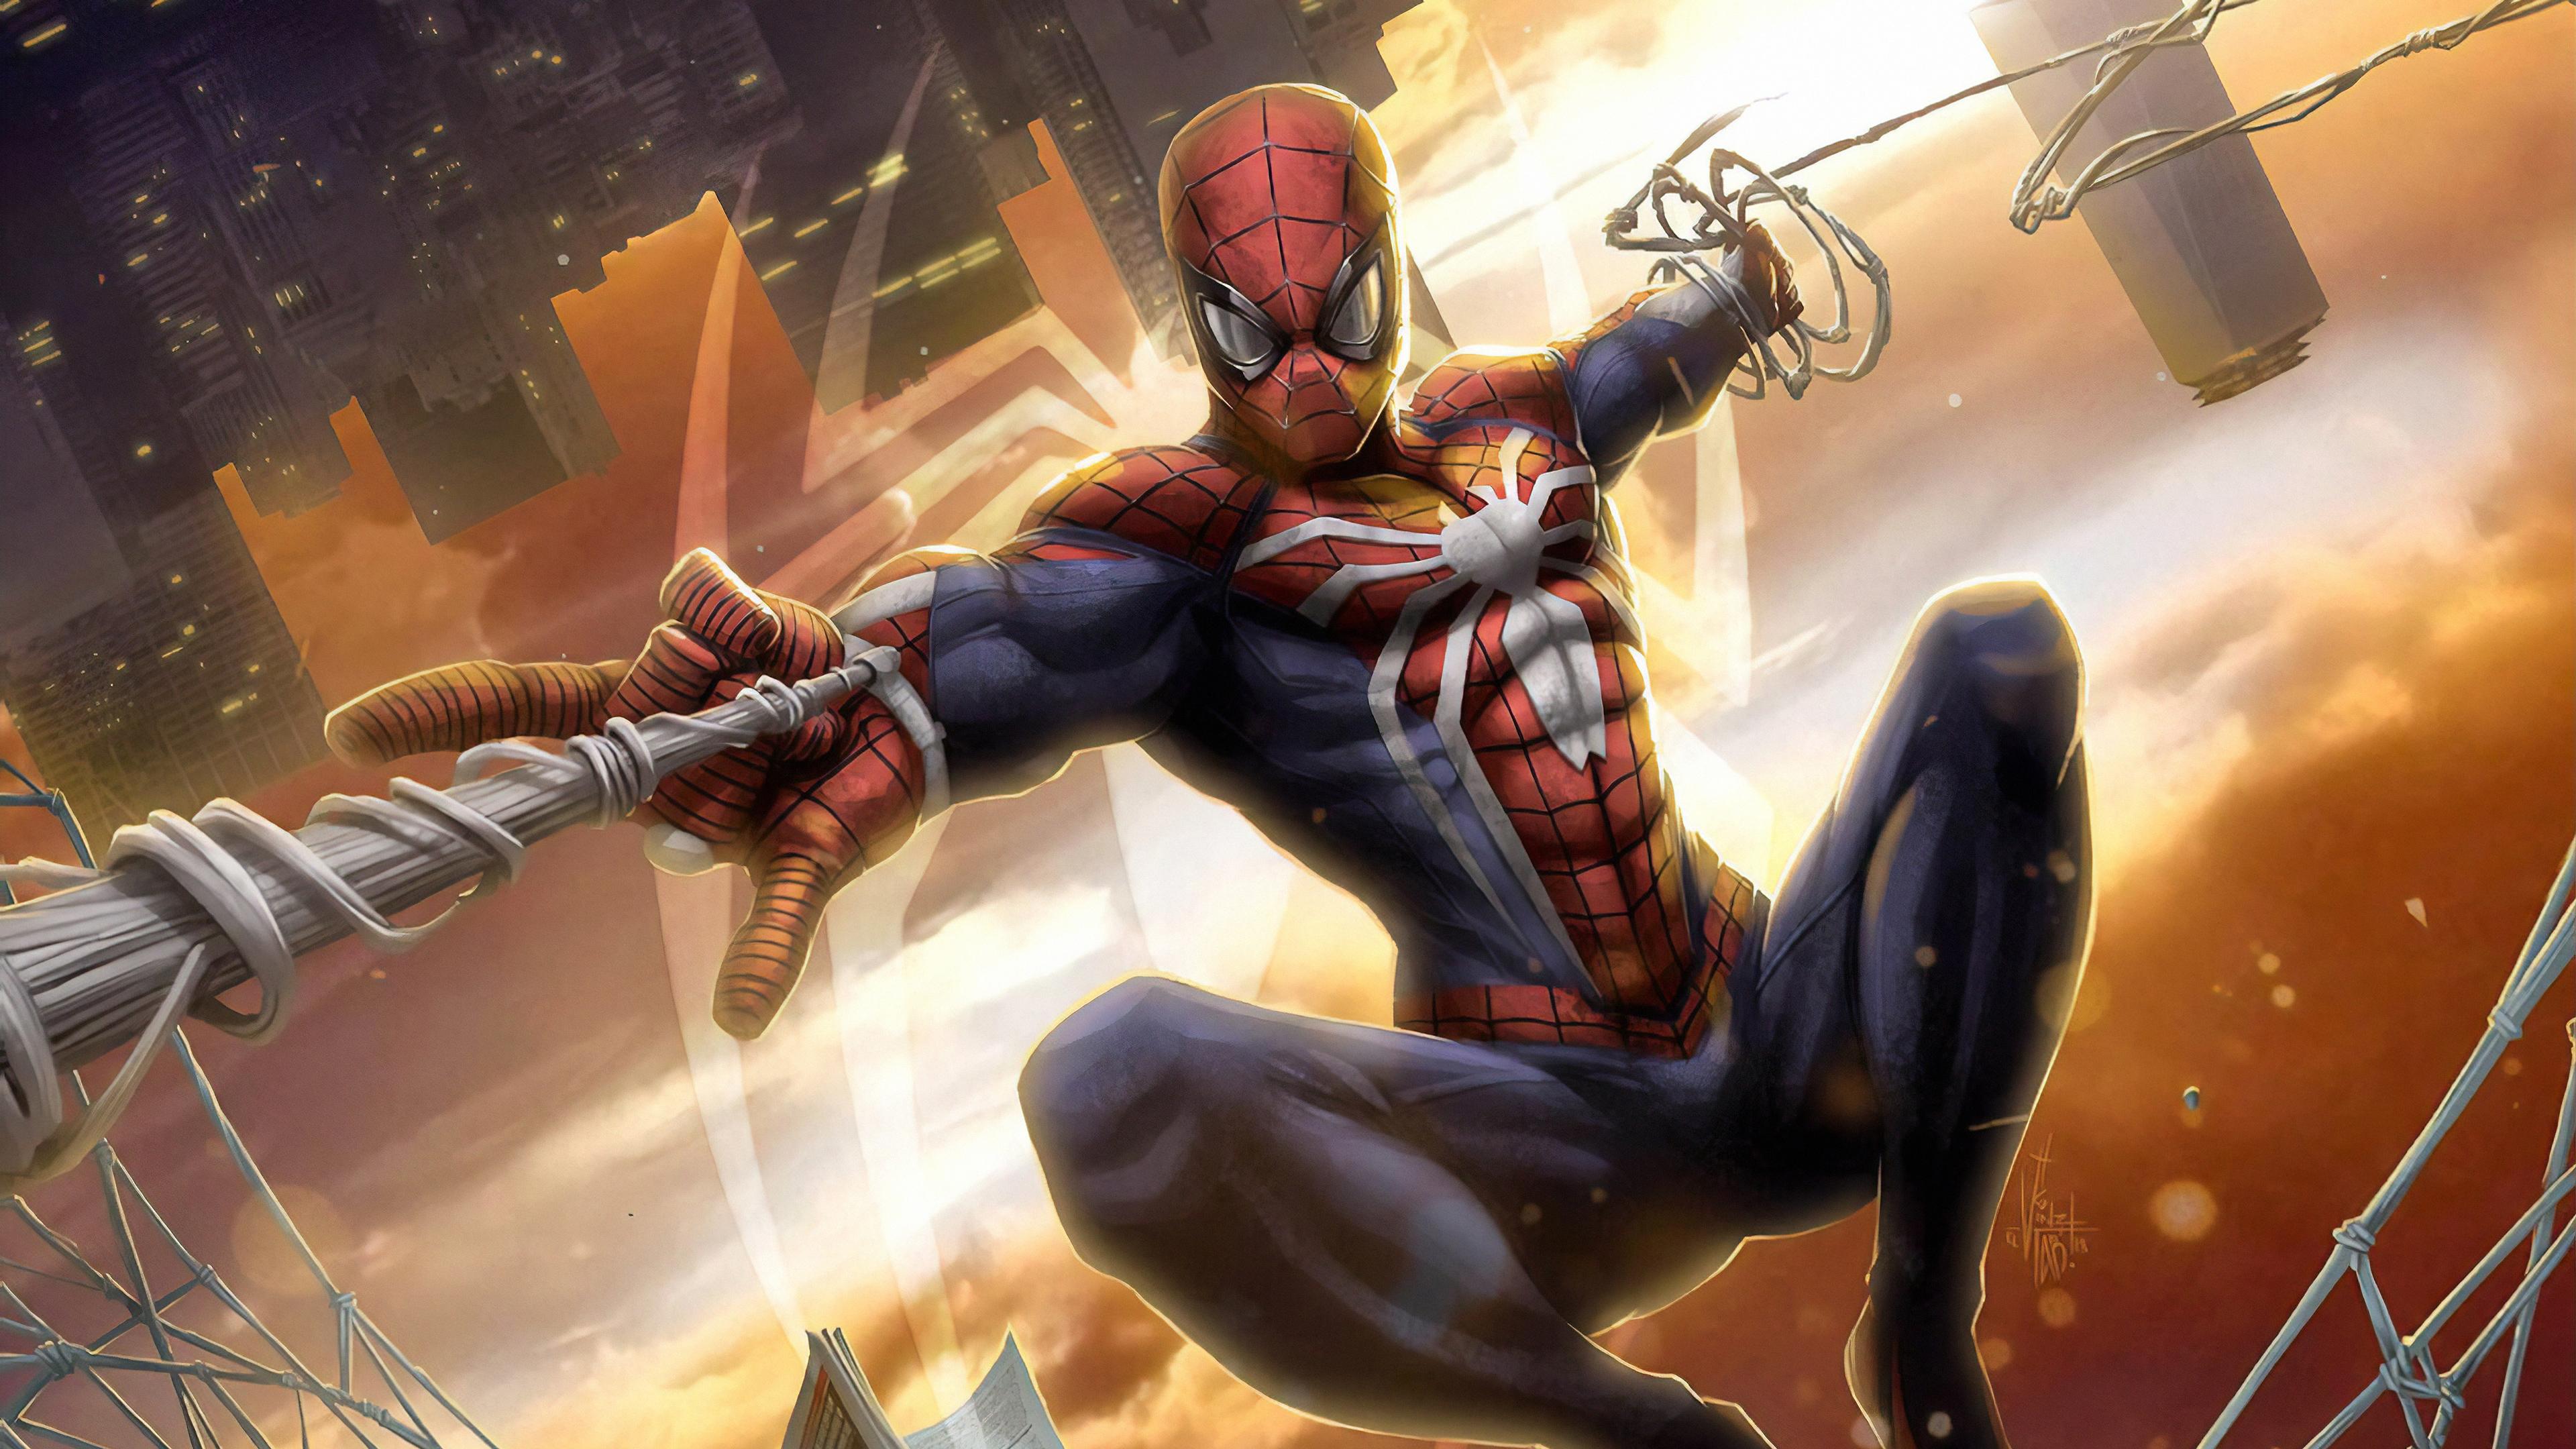 spiderman new york city 1568054983 - Spiderman New York City - superheroes wallpapers, spiderman wallpapers, hd-wallpapers, digital art wallpapers, artwork wallpapers, artstation wallpapers, art wallpapers, 4k-wallpapers